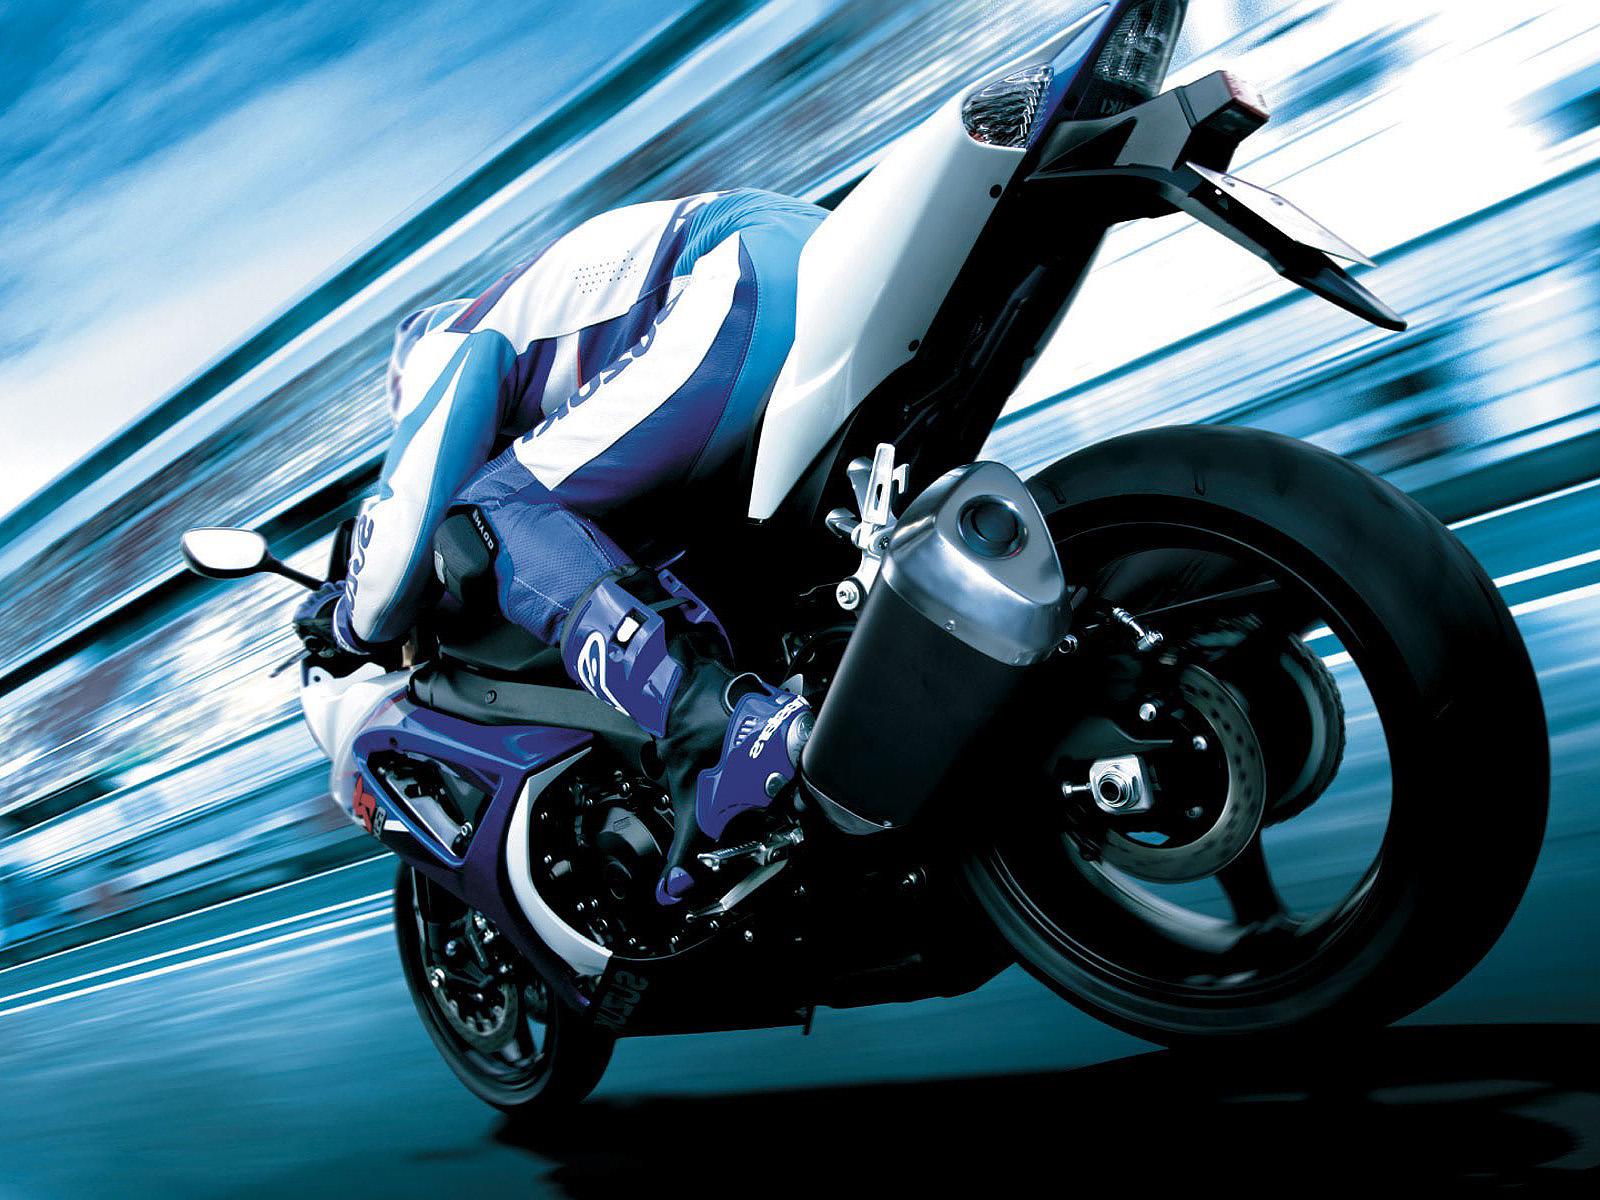 Best Top Desktop Motorcycles Wallpapers Hd Beautiful Motorcycle 1600x1200